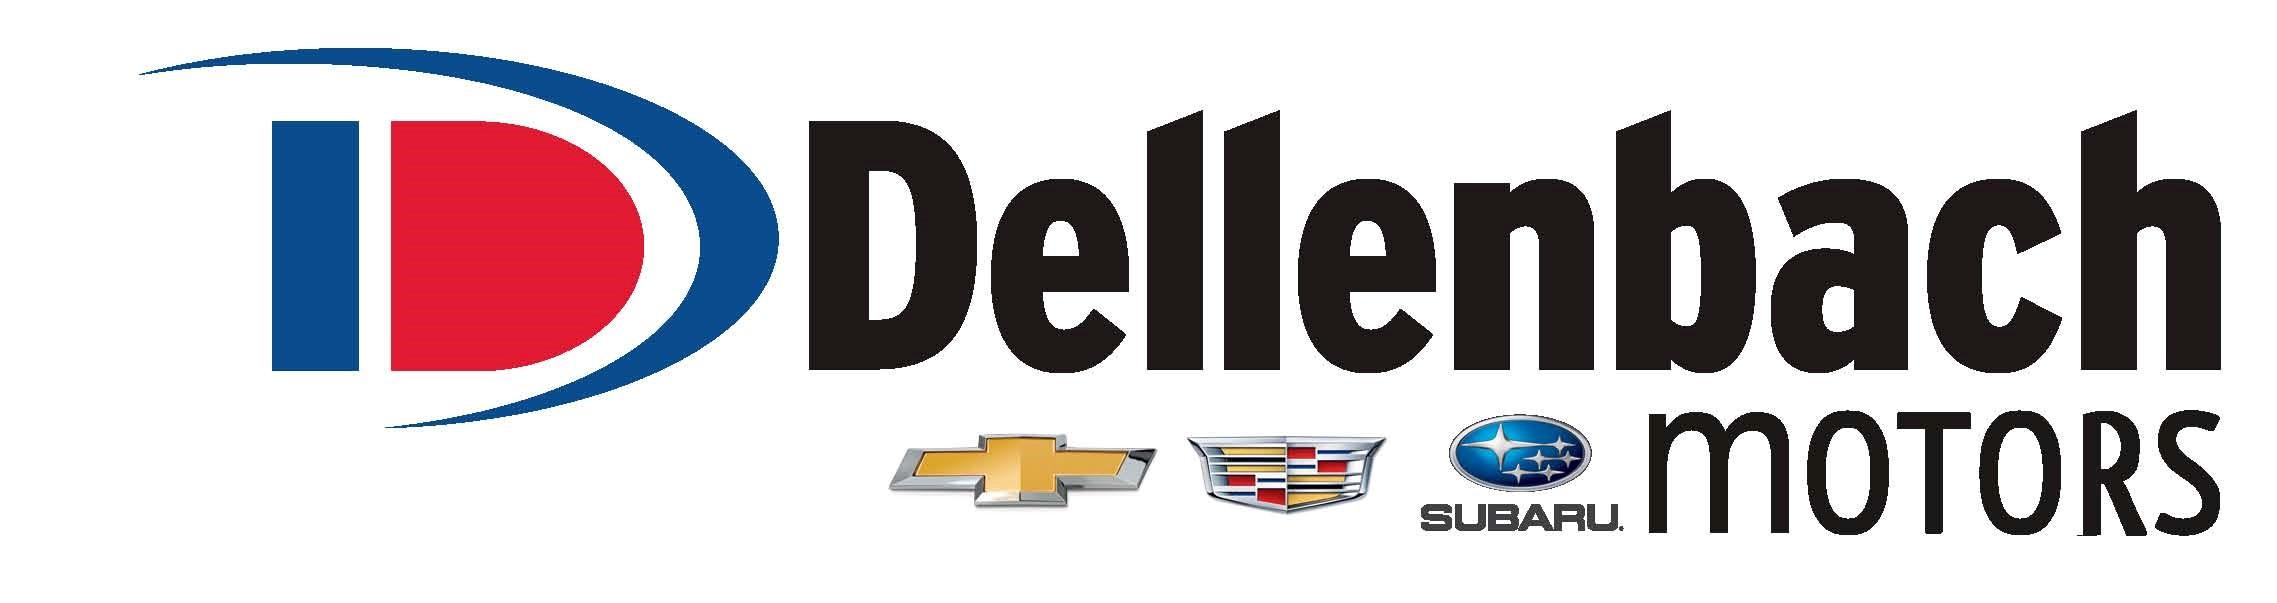 Dellenbach Motors Logo